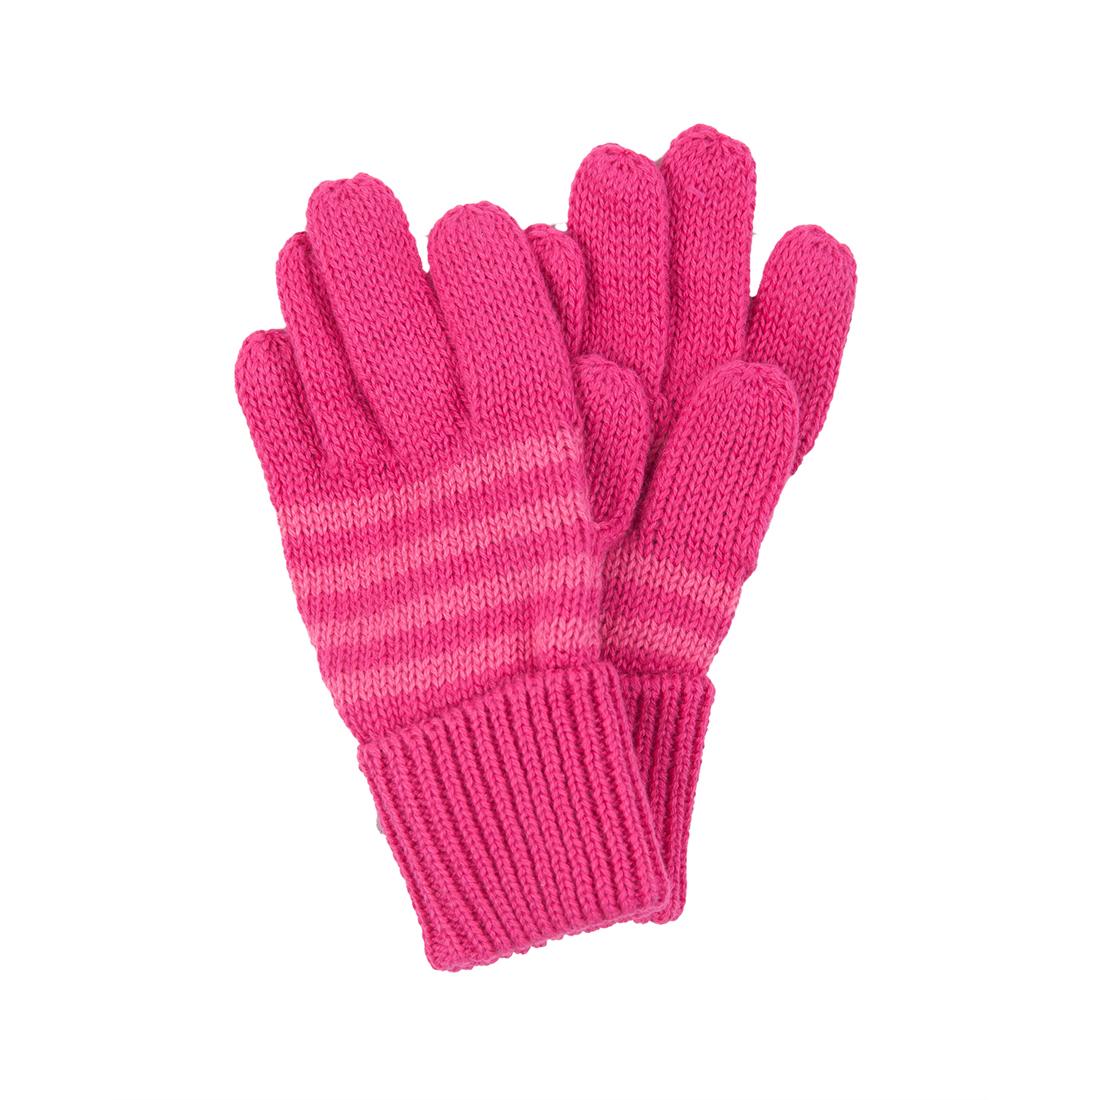 Перчатки KERRY GLEN K18096, размер 5